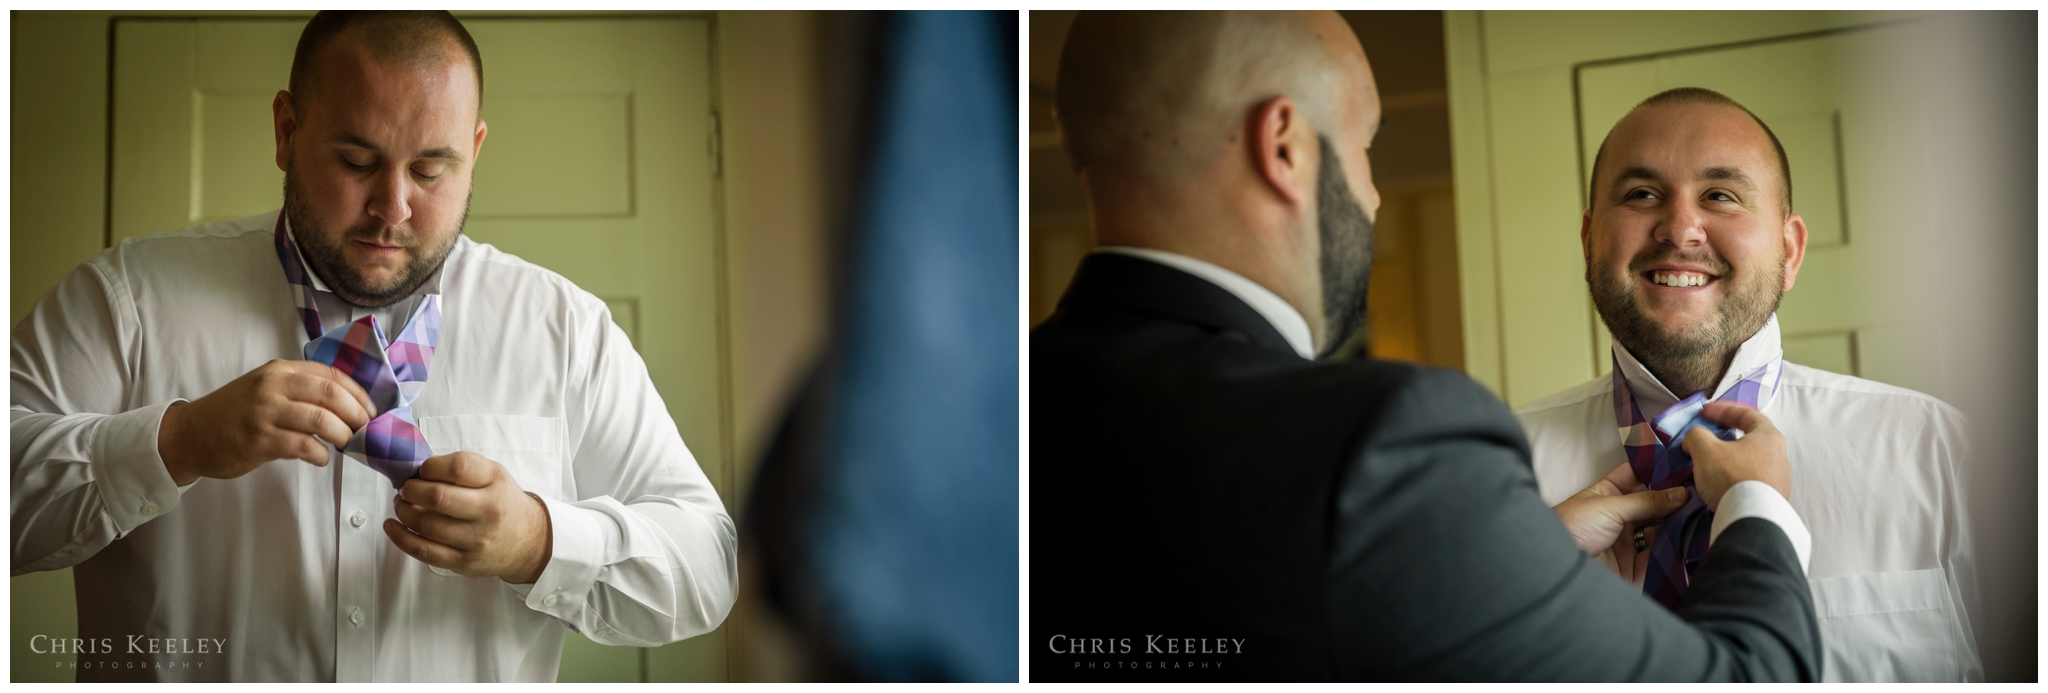 burrows-new-hampshire-wedding-photographer-chris-keeley-01.jpg